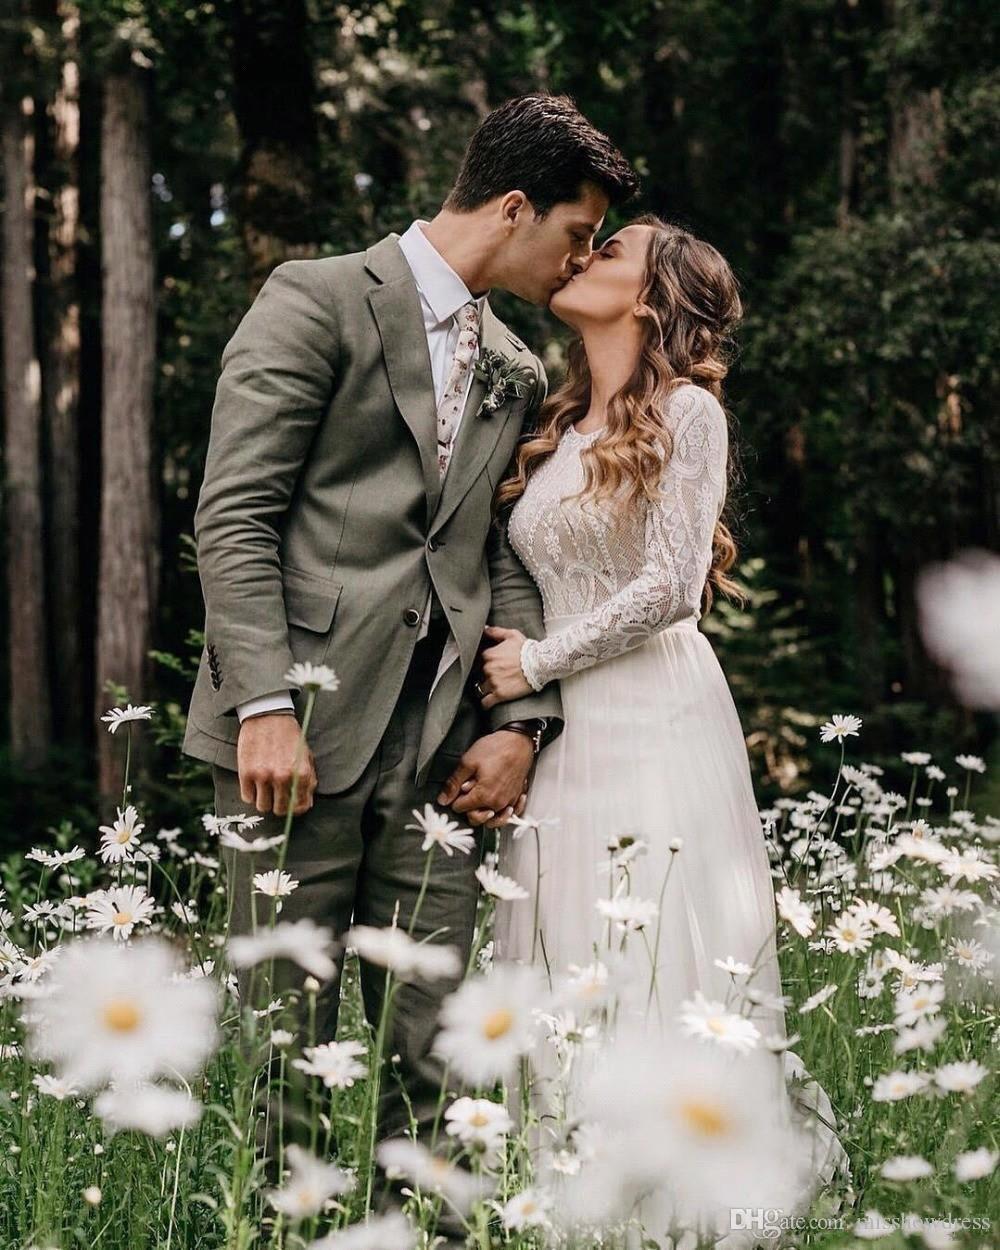 https://www.dhresource.com/0x0s/f2-albu-g8-M00-E0-08-rBVaV10LXh6AIZy0AATpWAJuYTM153.jpg/beach-bohemian-wedding-dresses-sexy-backless.jpg